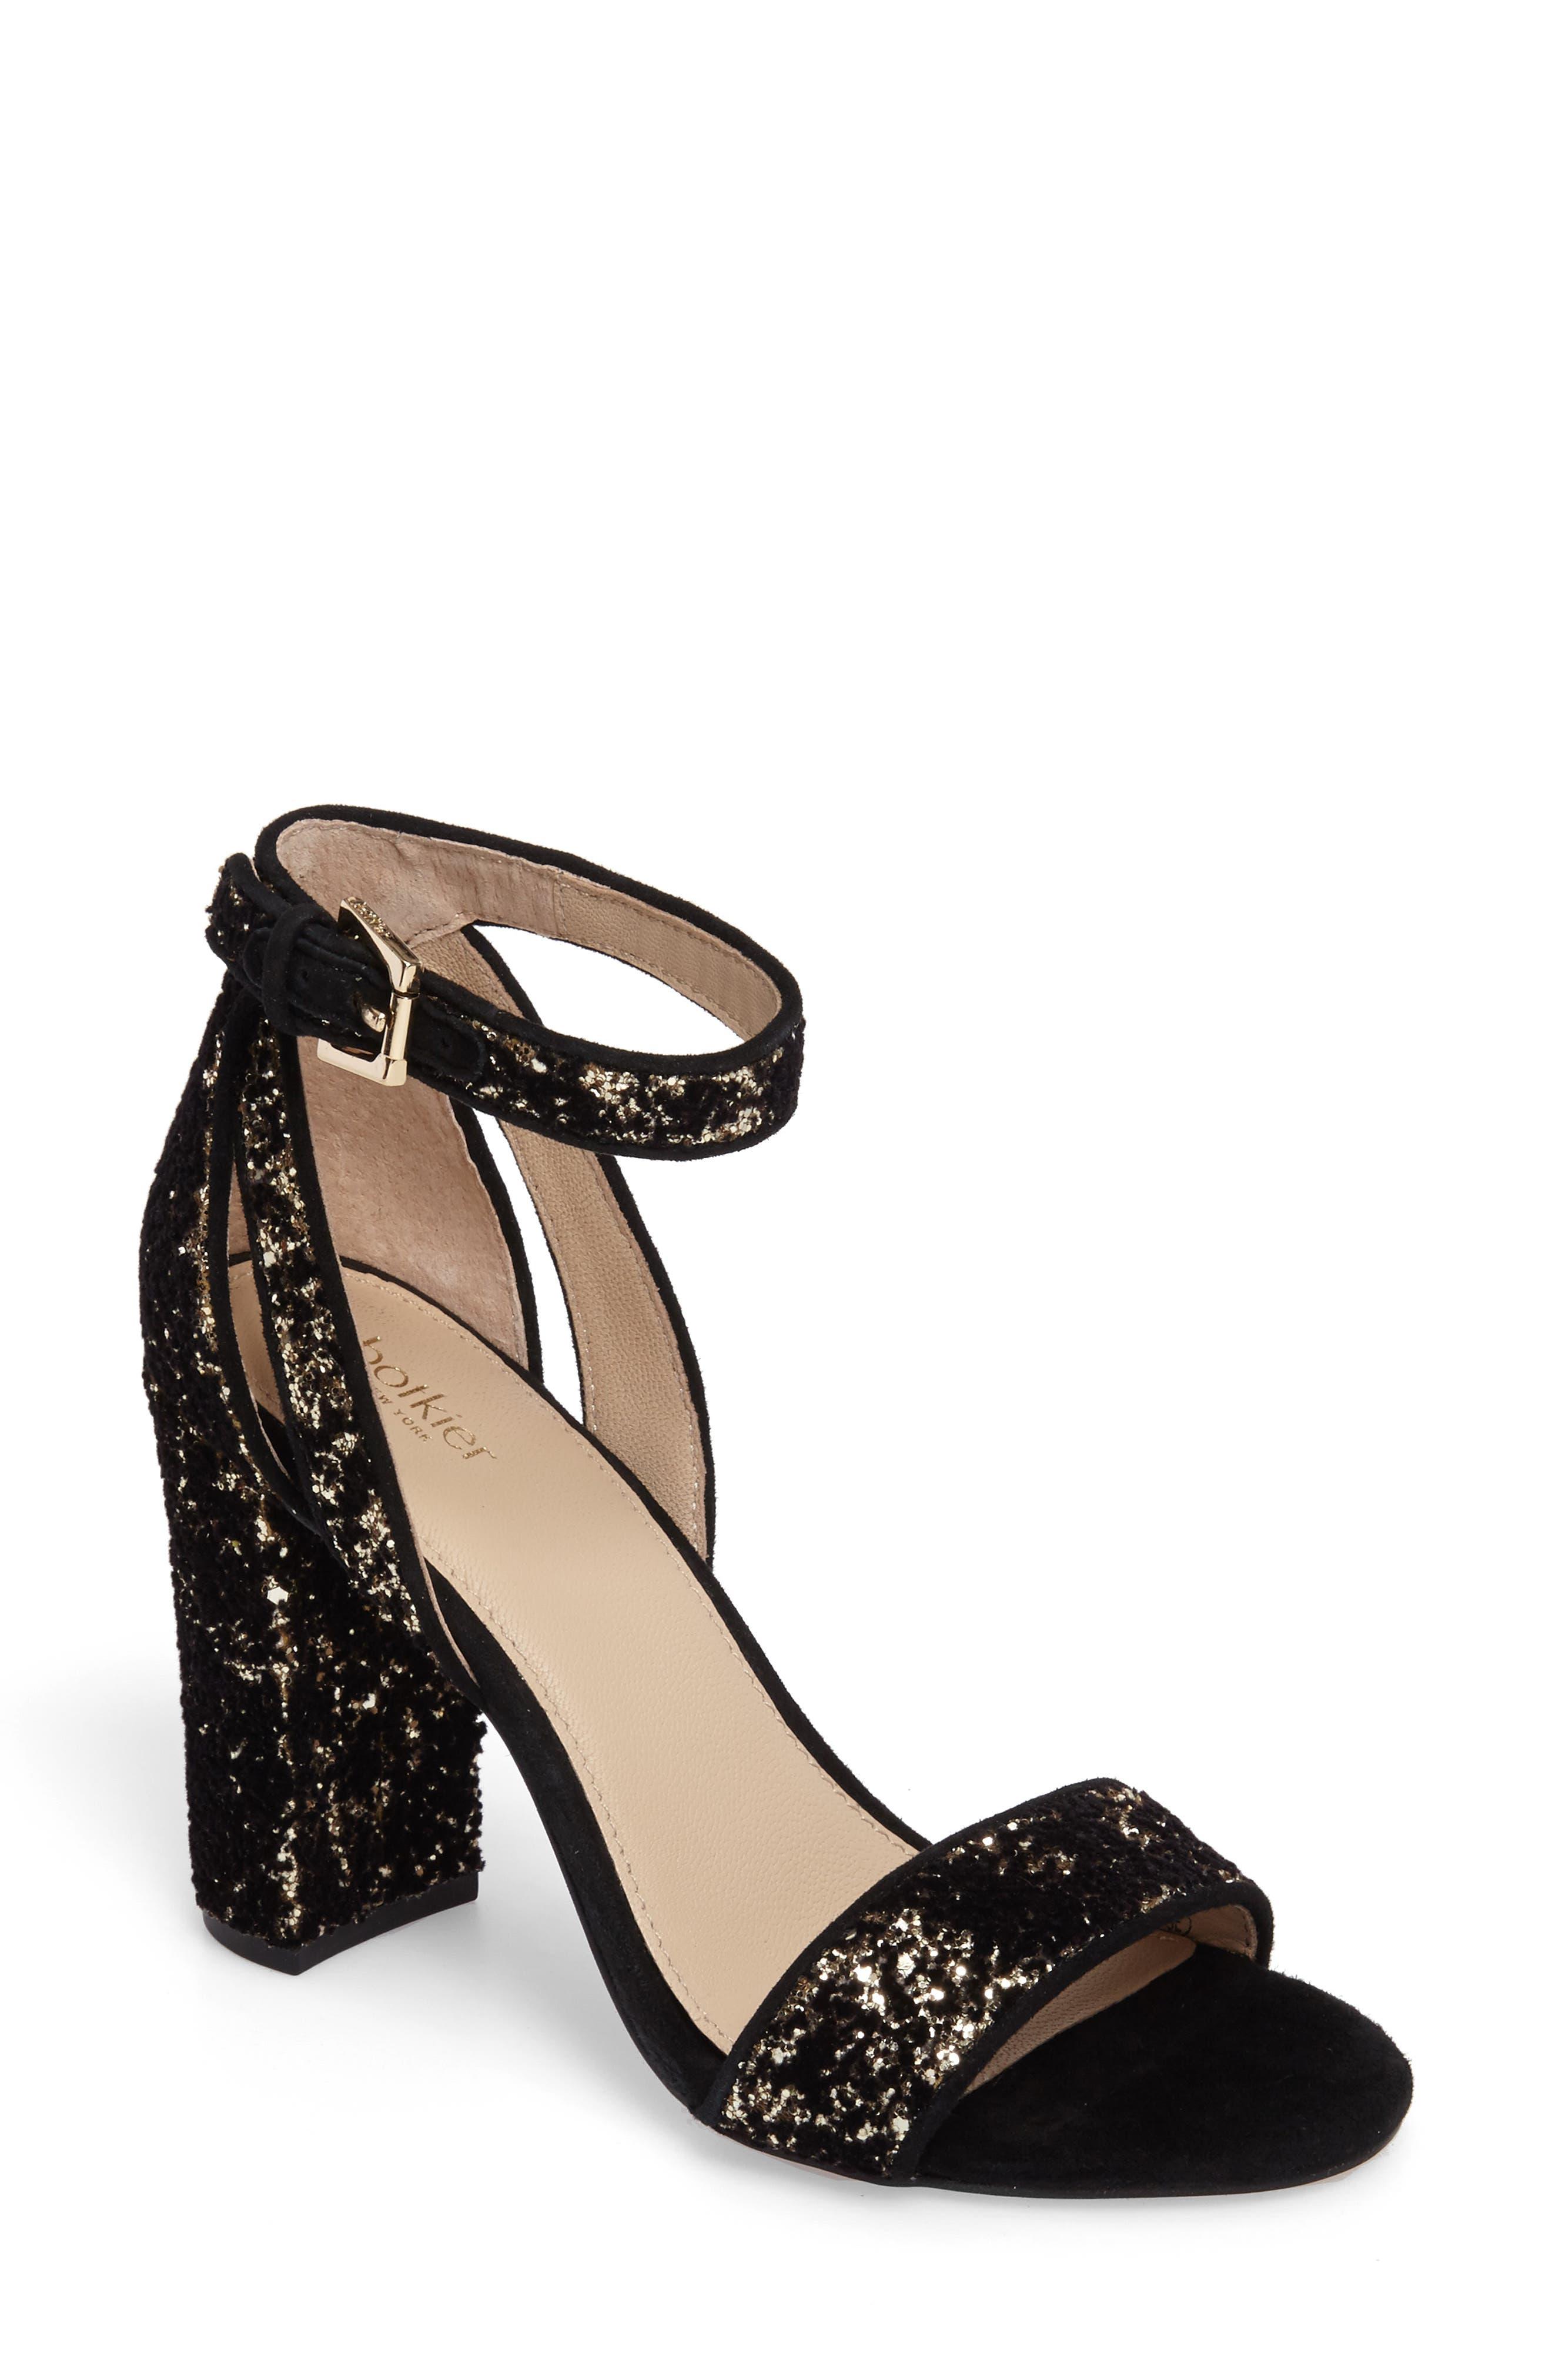 Main Image - Botkier Gianna Ankle Strap Sandal (Women)